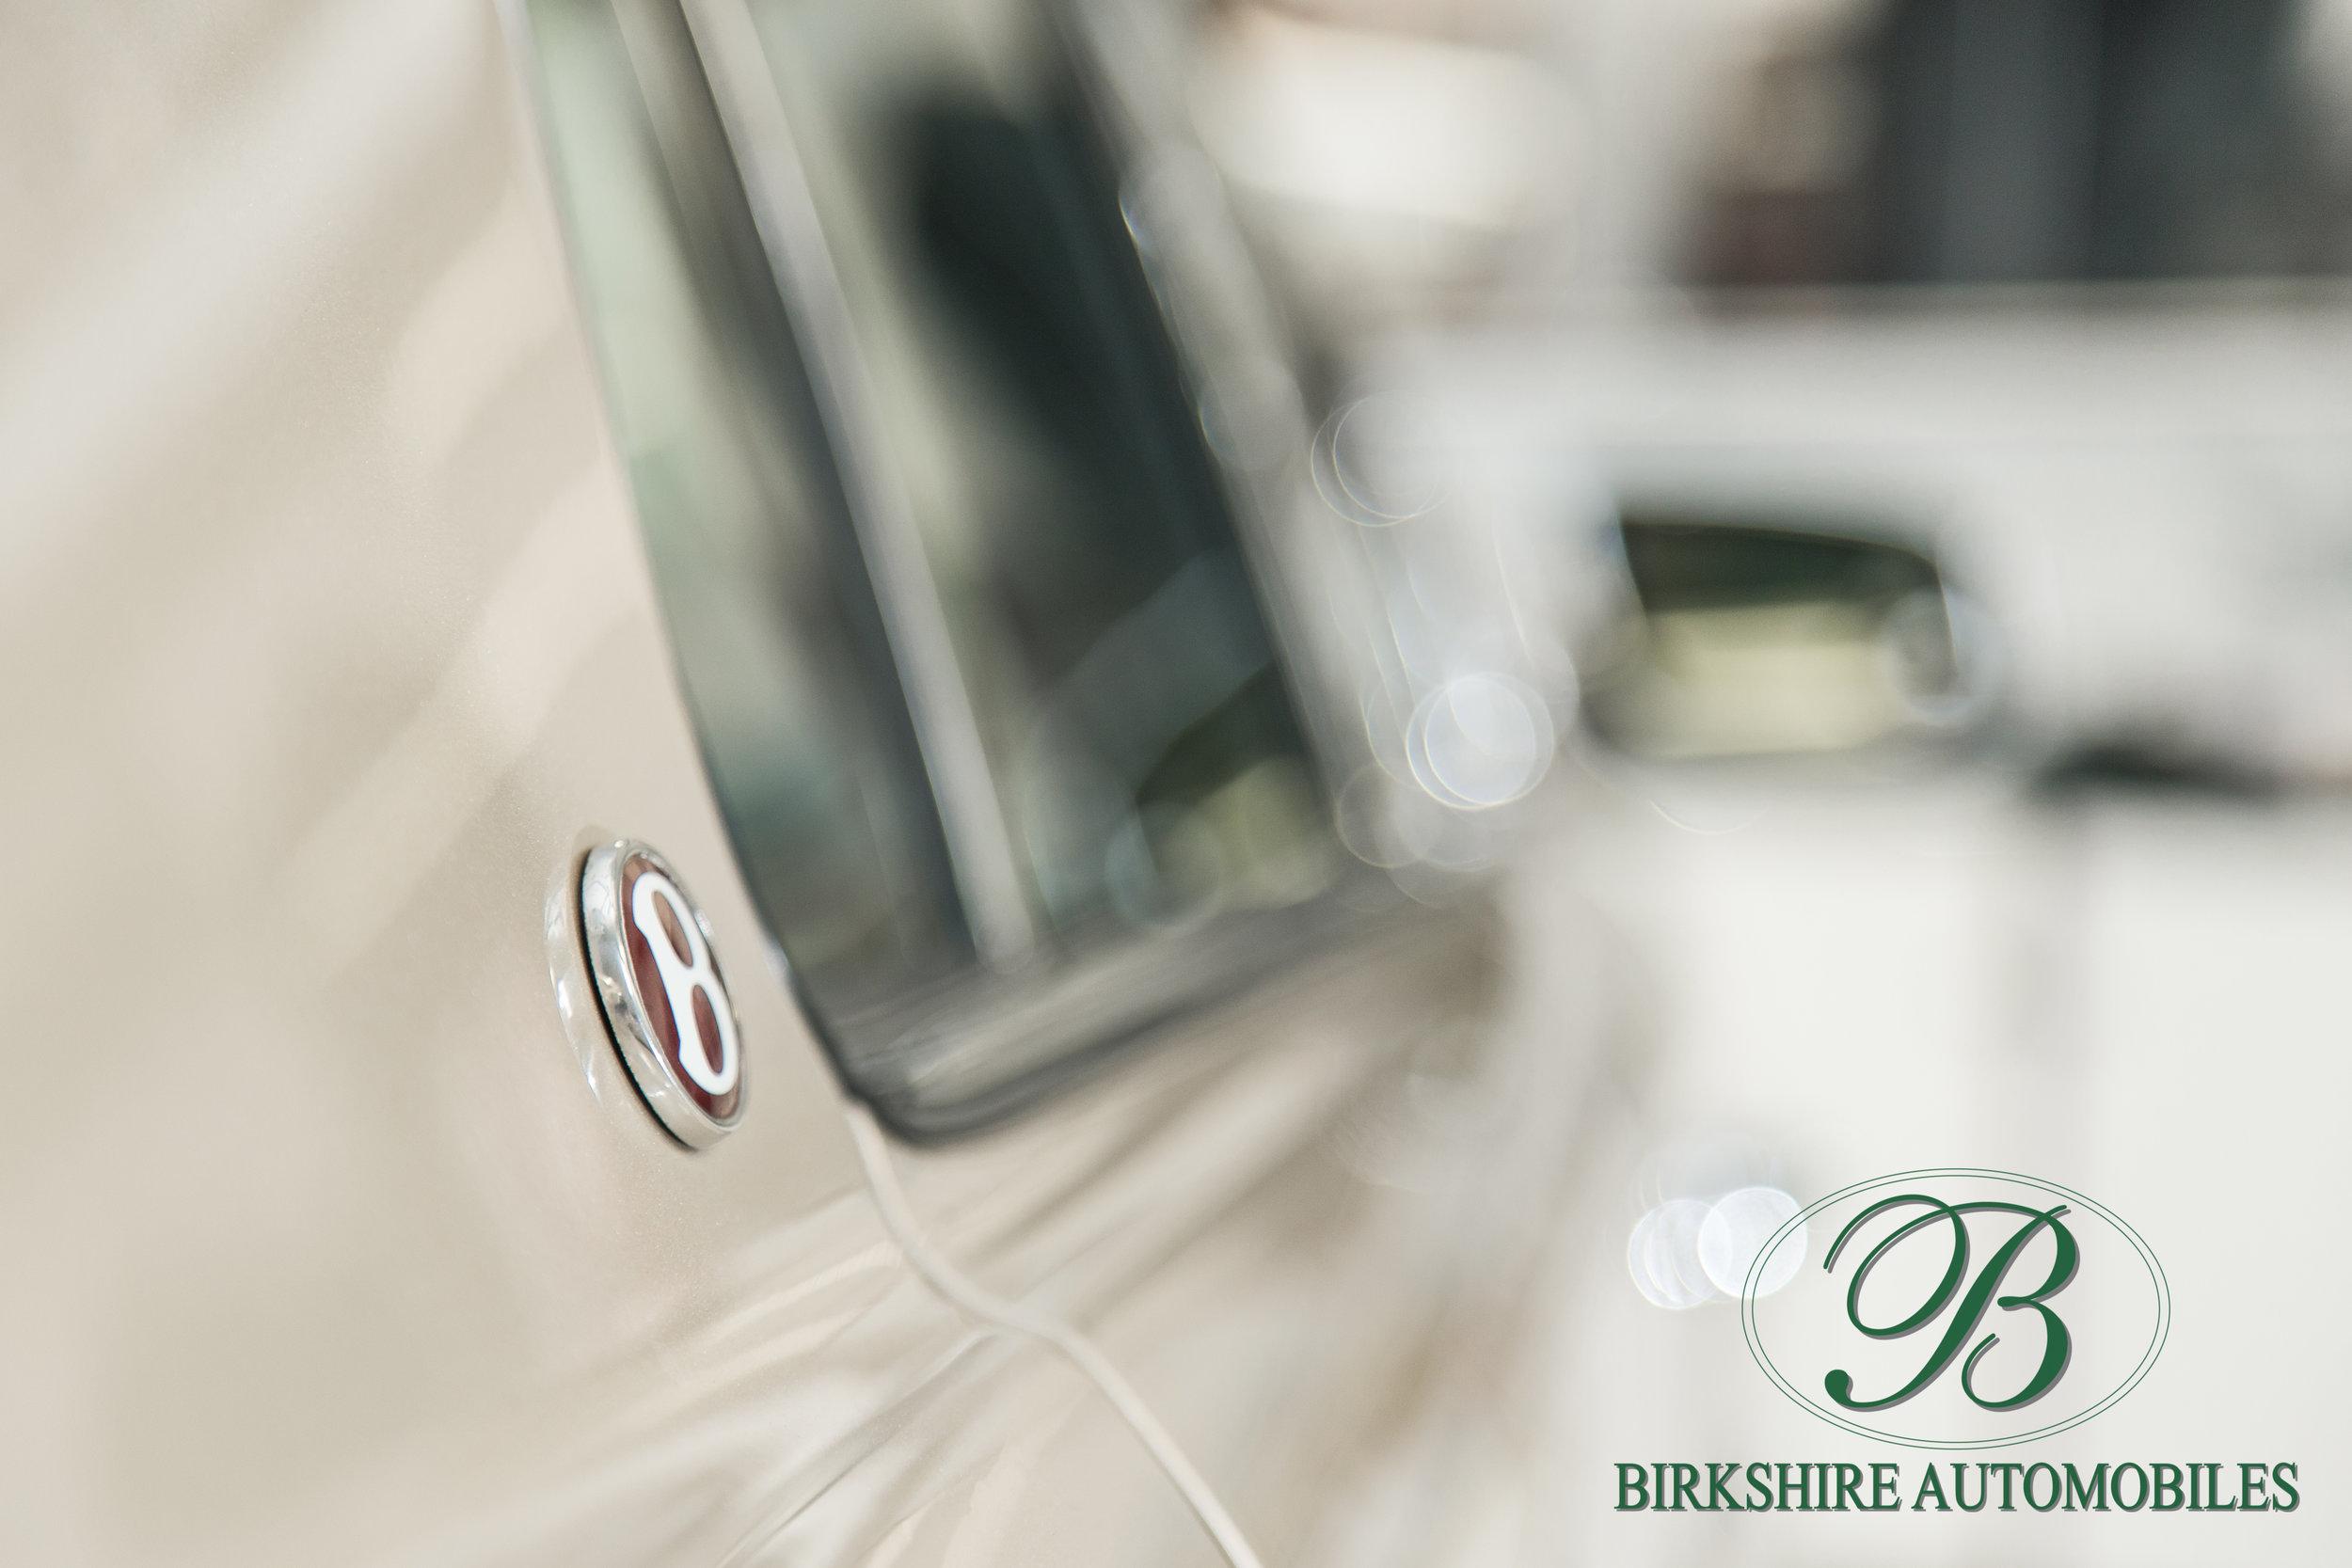 Birkshire Automobiles-349.jpg